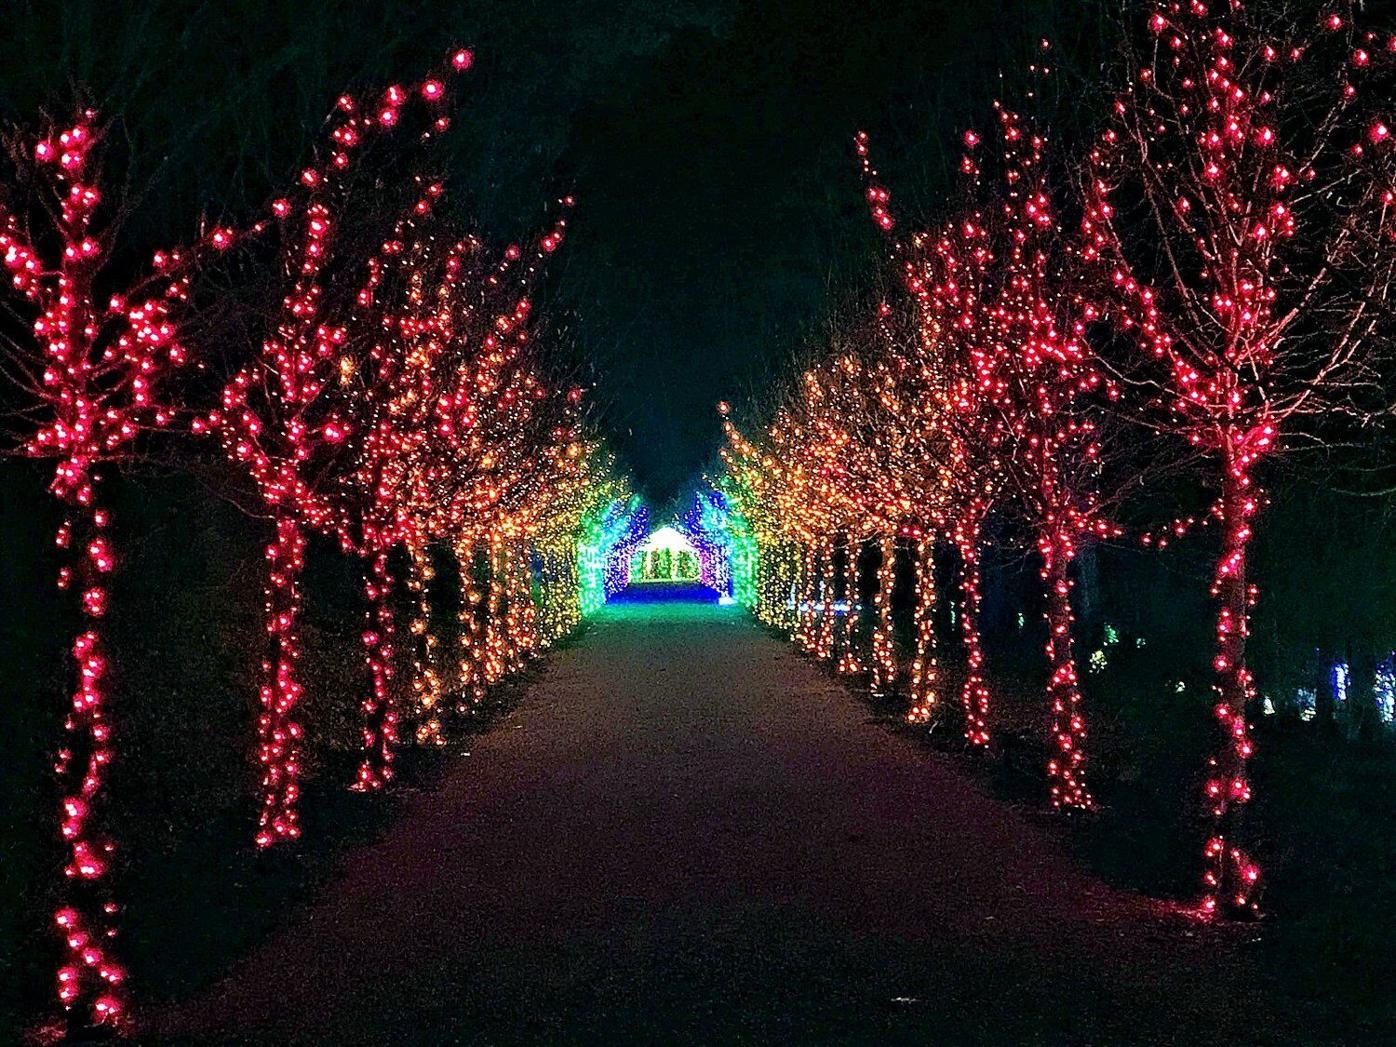 Winterlights: Naumkeag doubles down on holiday spirit